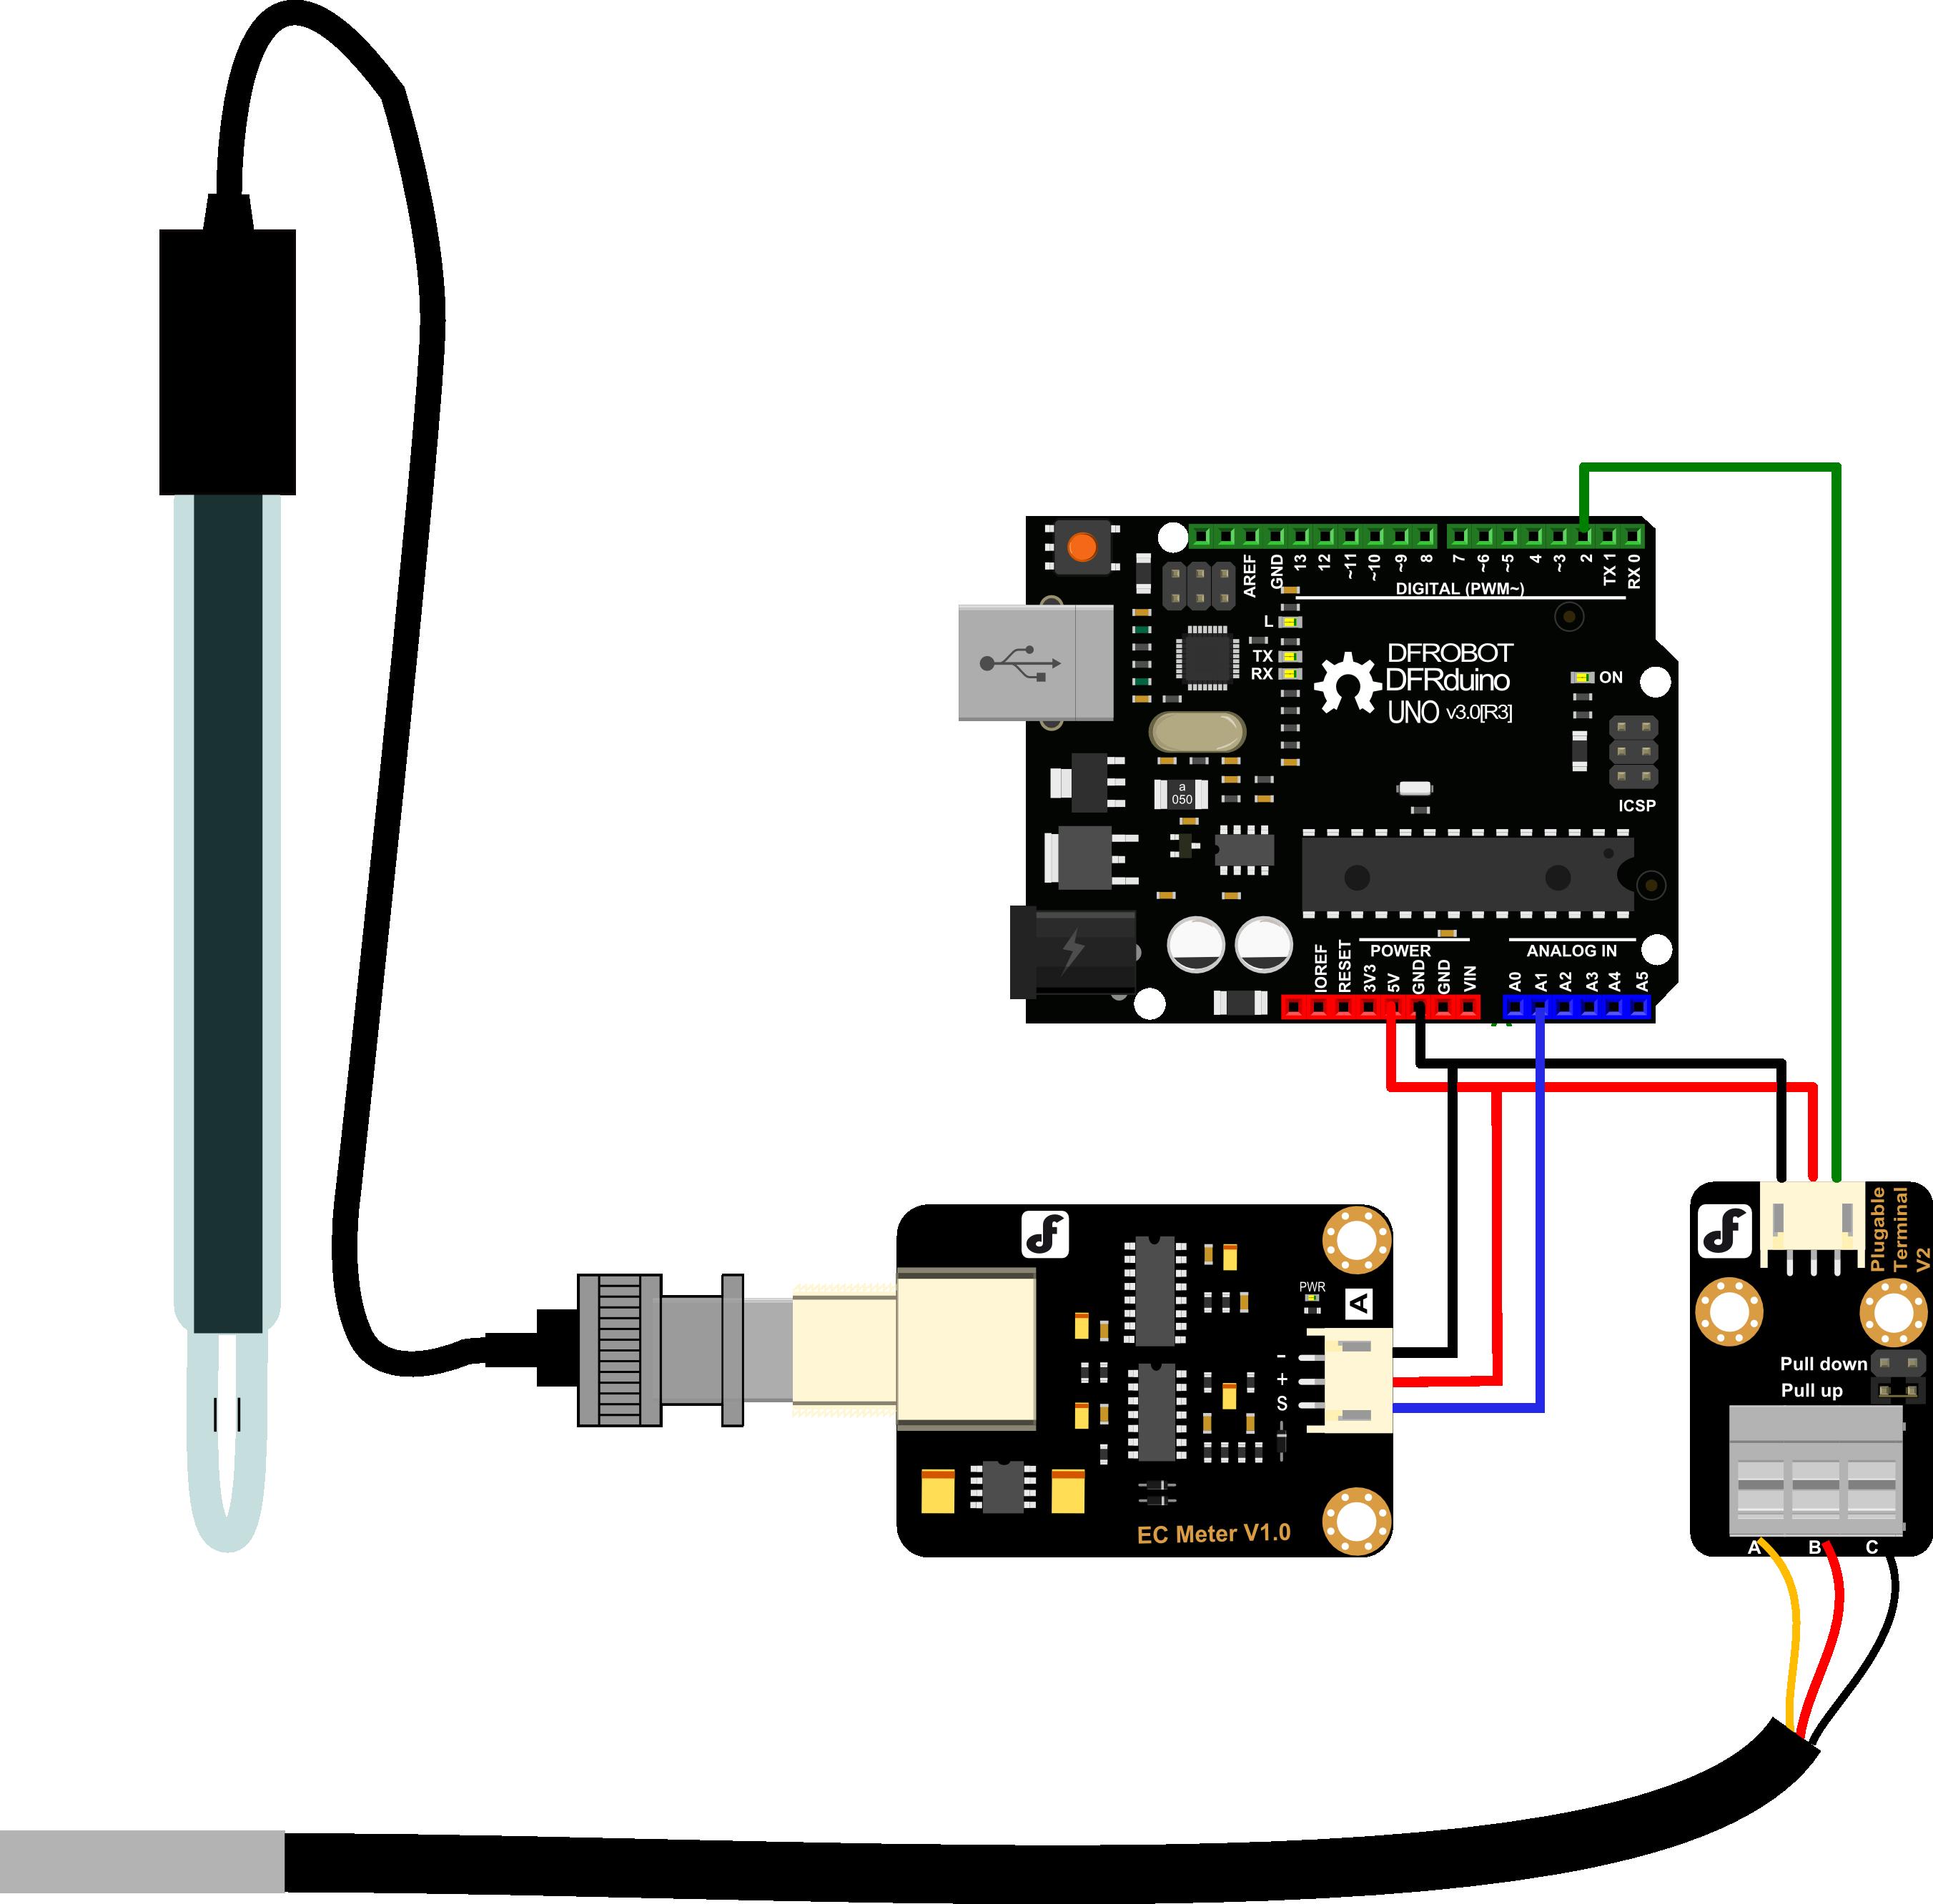 Gravity Analog Electrical Conductivity Sensor Meter For Arduino Home Relay Shield V2 1 Dfrobot Application